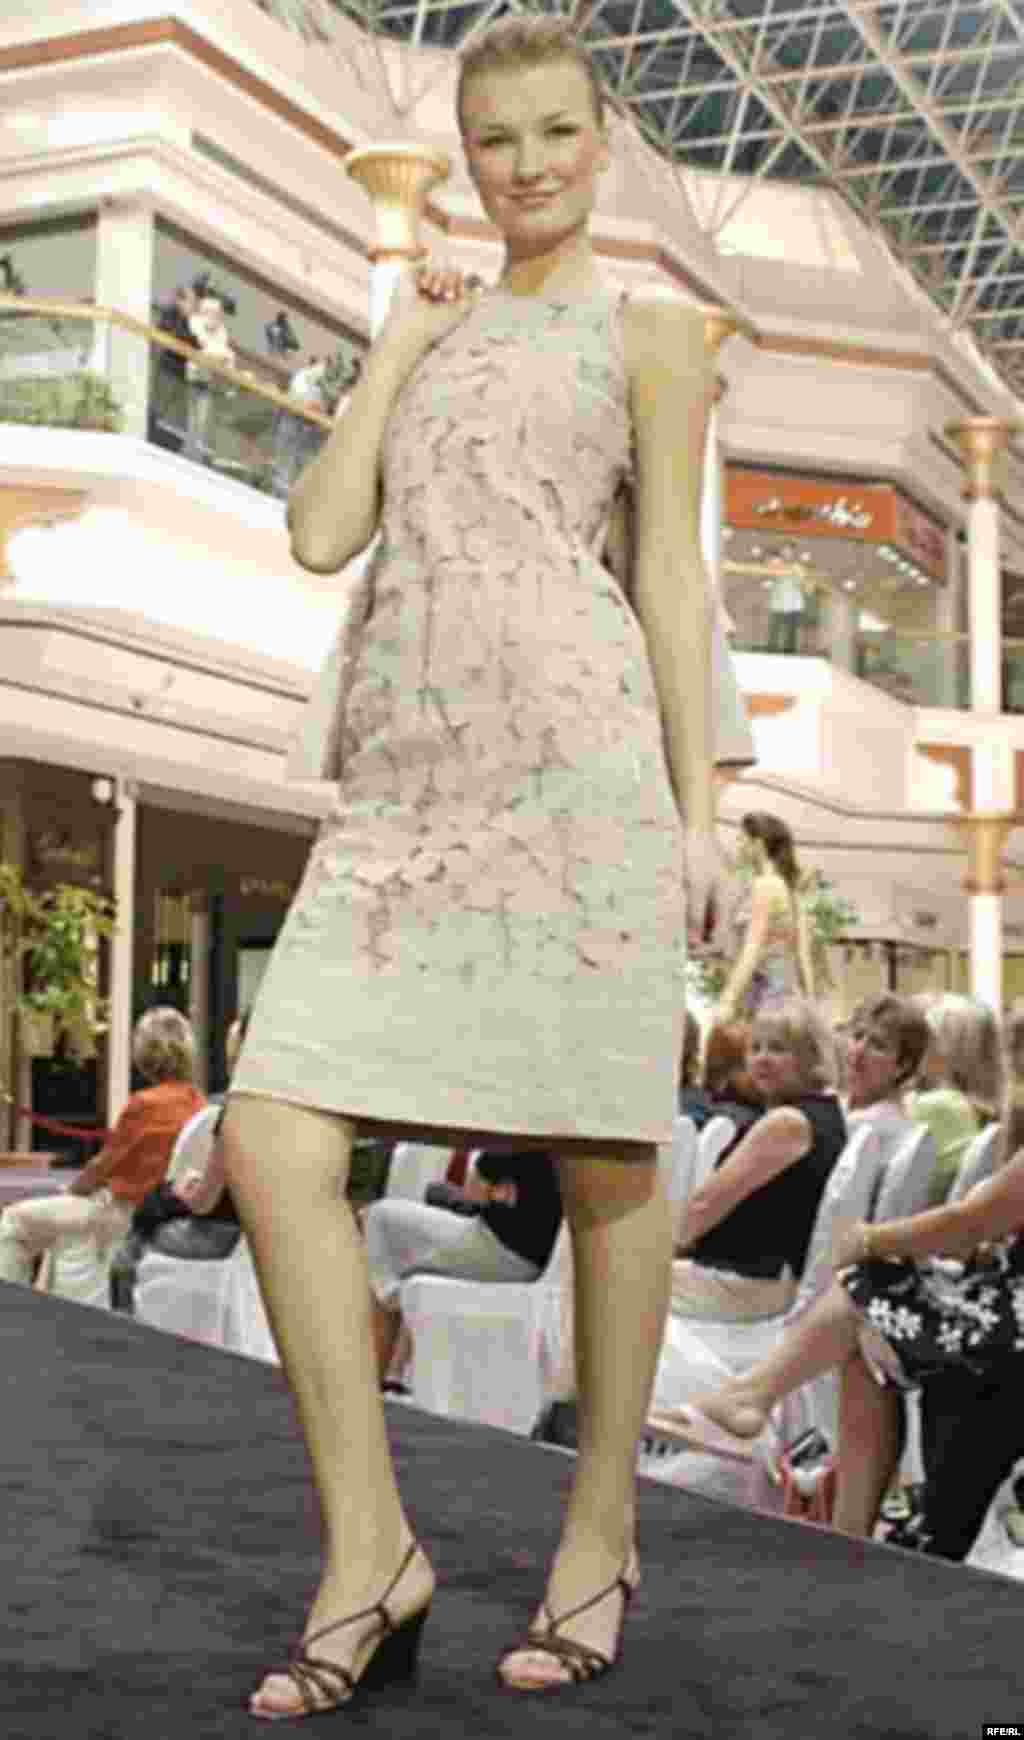 U.A.E, Dubai Fashion show, 03/09/2007